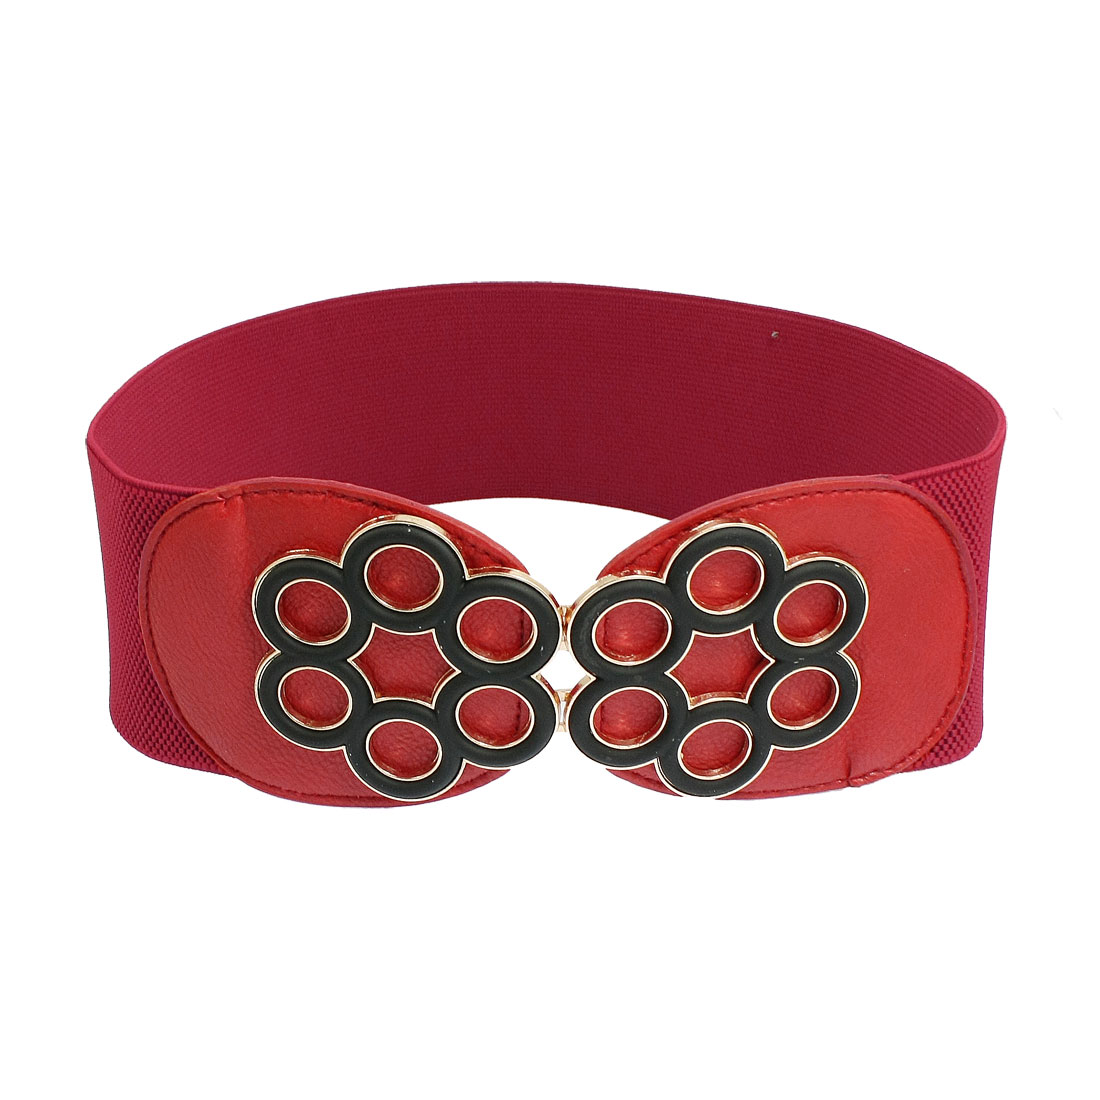 Women 6 Petal Flower Textured Red Faux Leather Elastic Waist Belt Strap